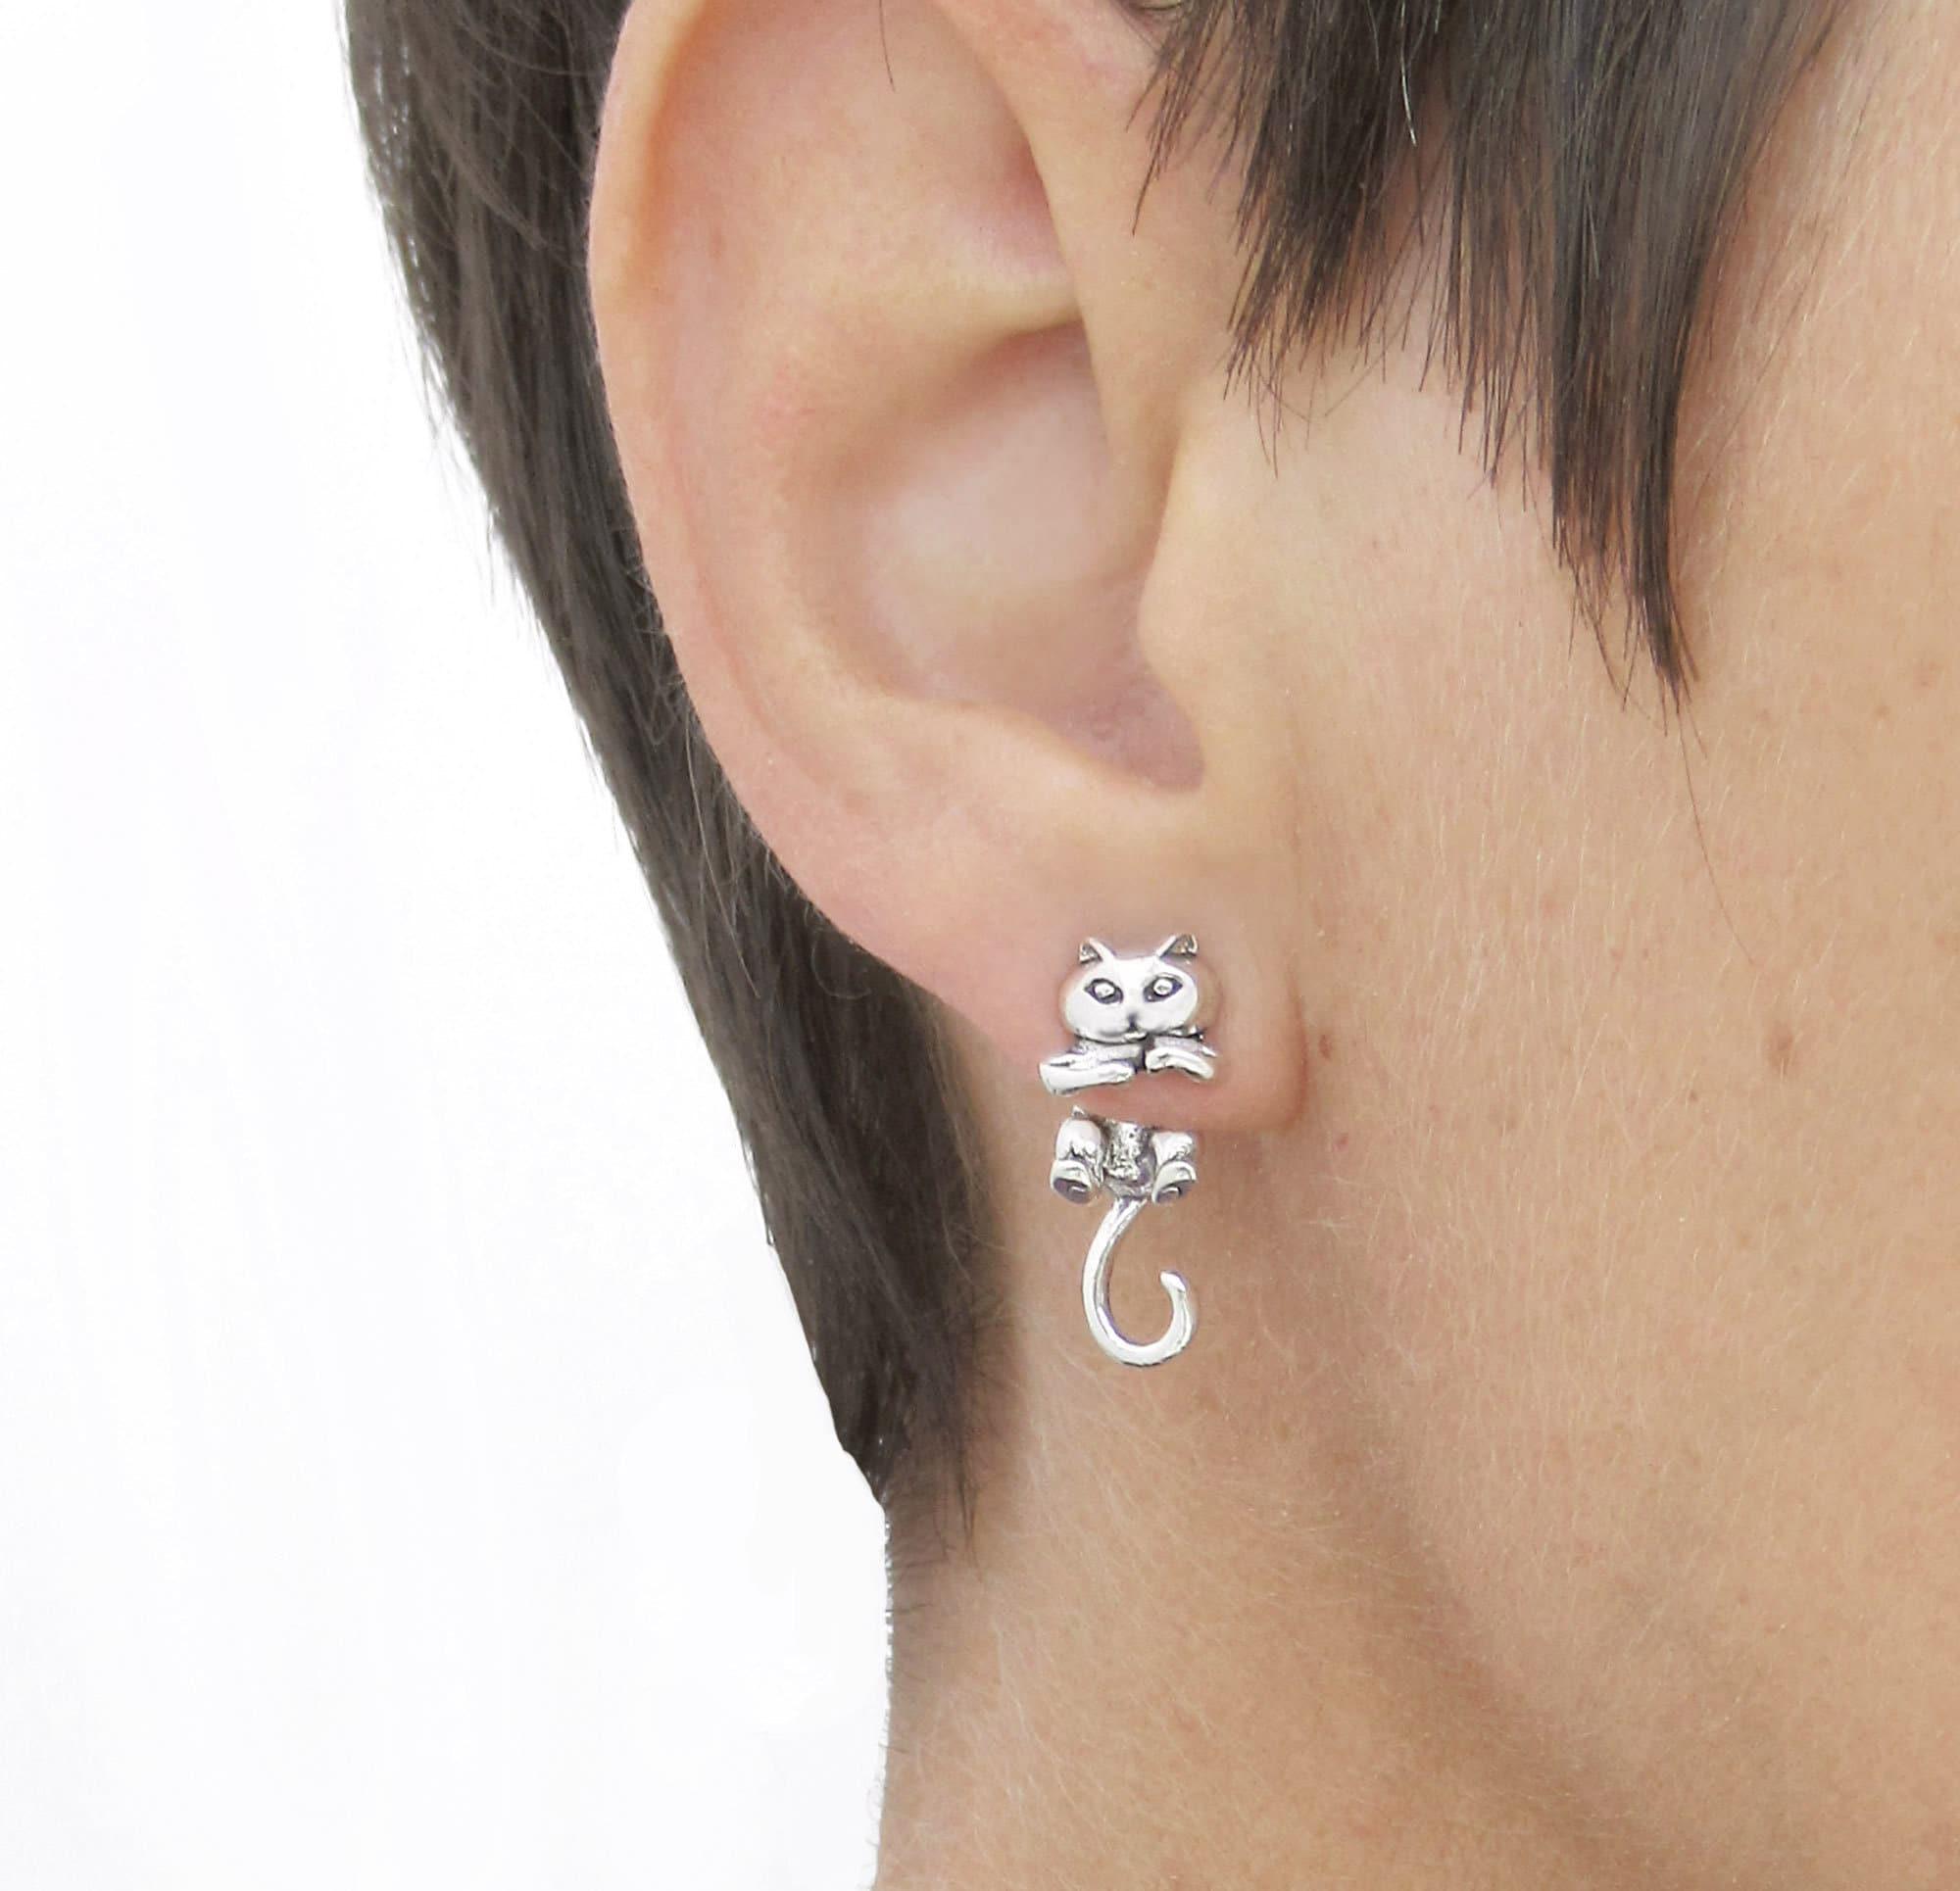 51b94d8133053 Silver Cat studs Cat Earrings Double sided stud earrings Cat Ear Jacket Cat  jewelry Cat Mum gift Front back earrings Two piece cat studs